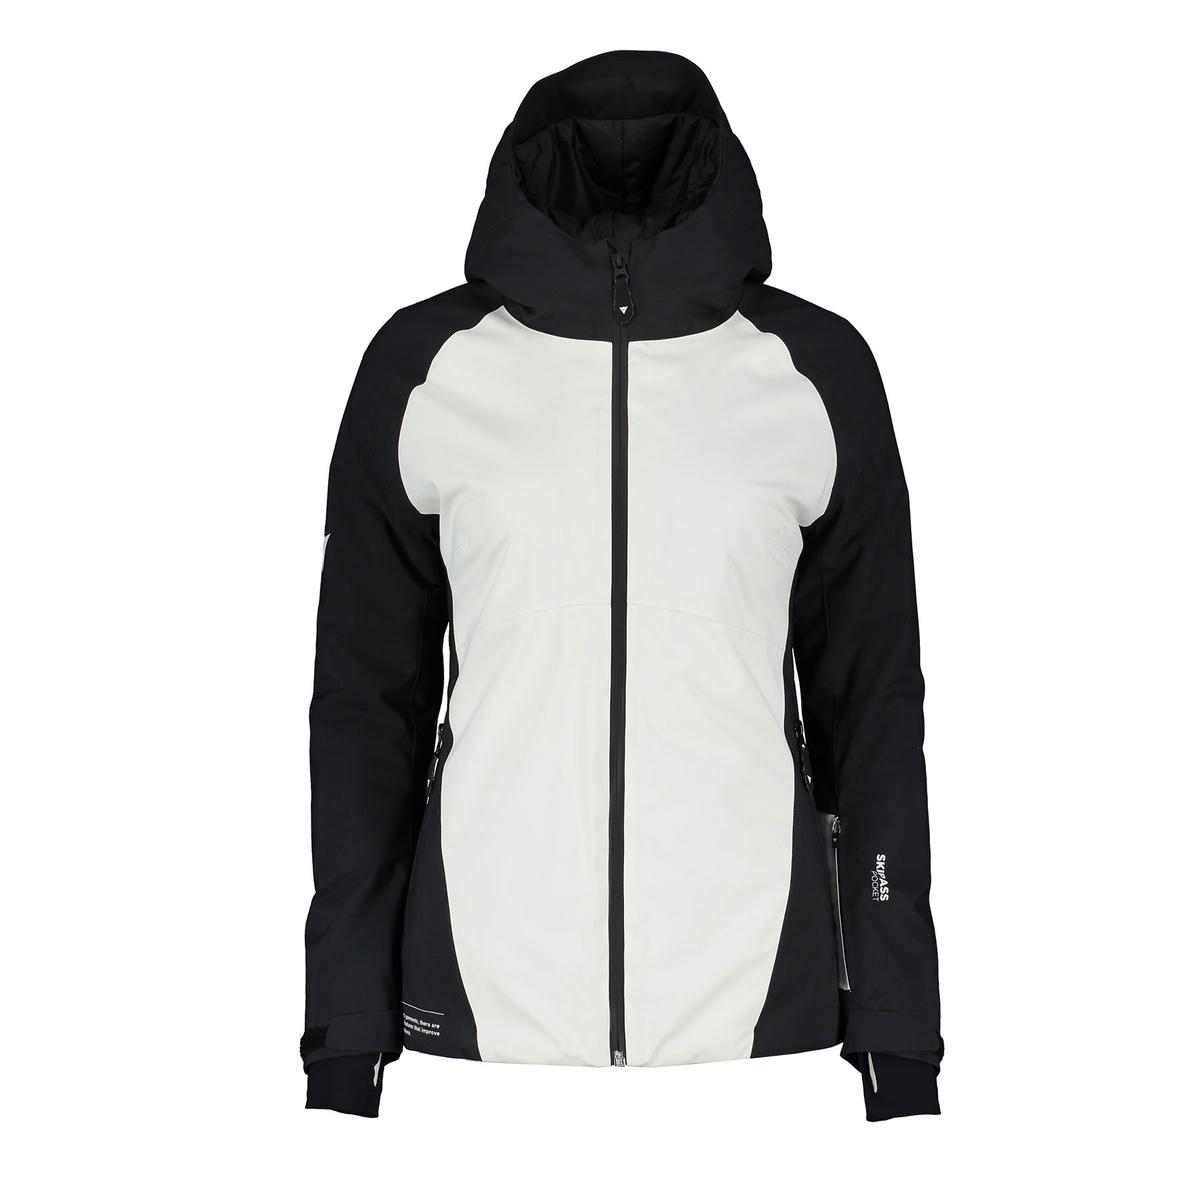 completo giacca HP2 L4 + pantaloni HP2 PL4 DONNA